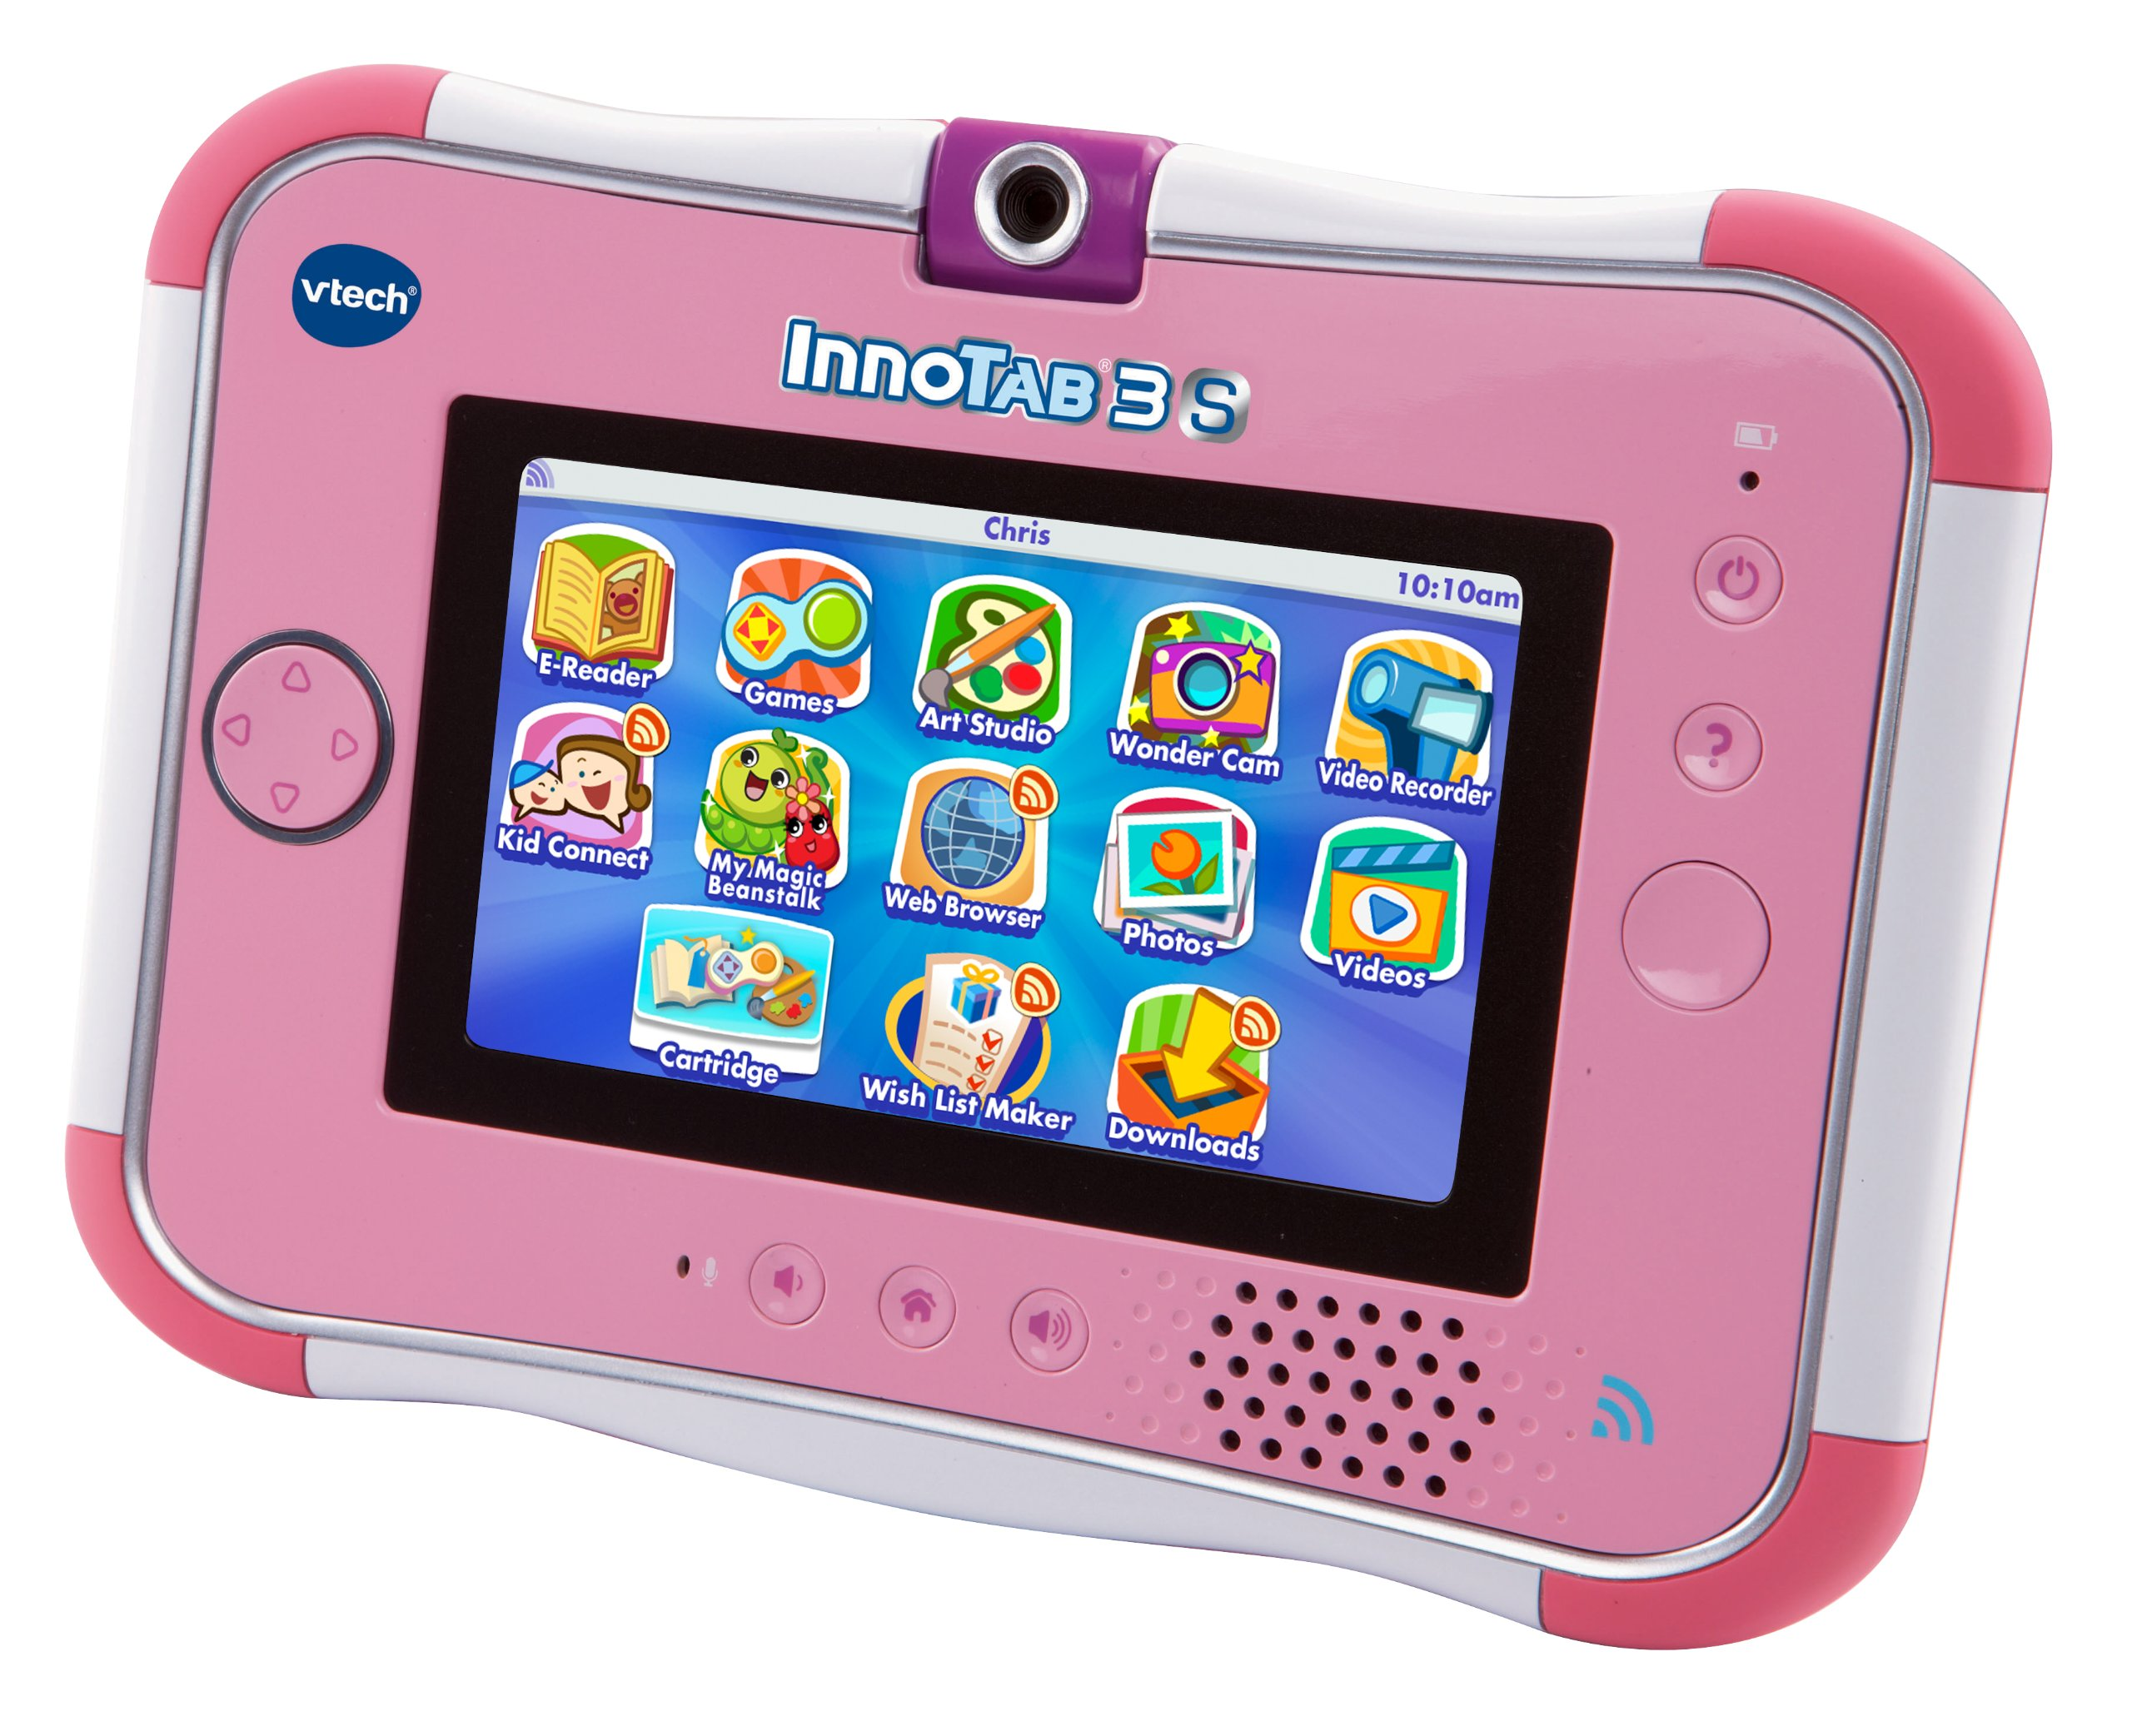 VTech InnoTab 3S Kids Tablet, Pink by VTech (Image #2)